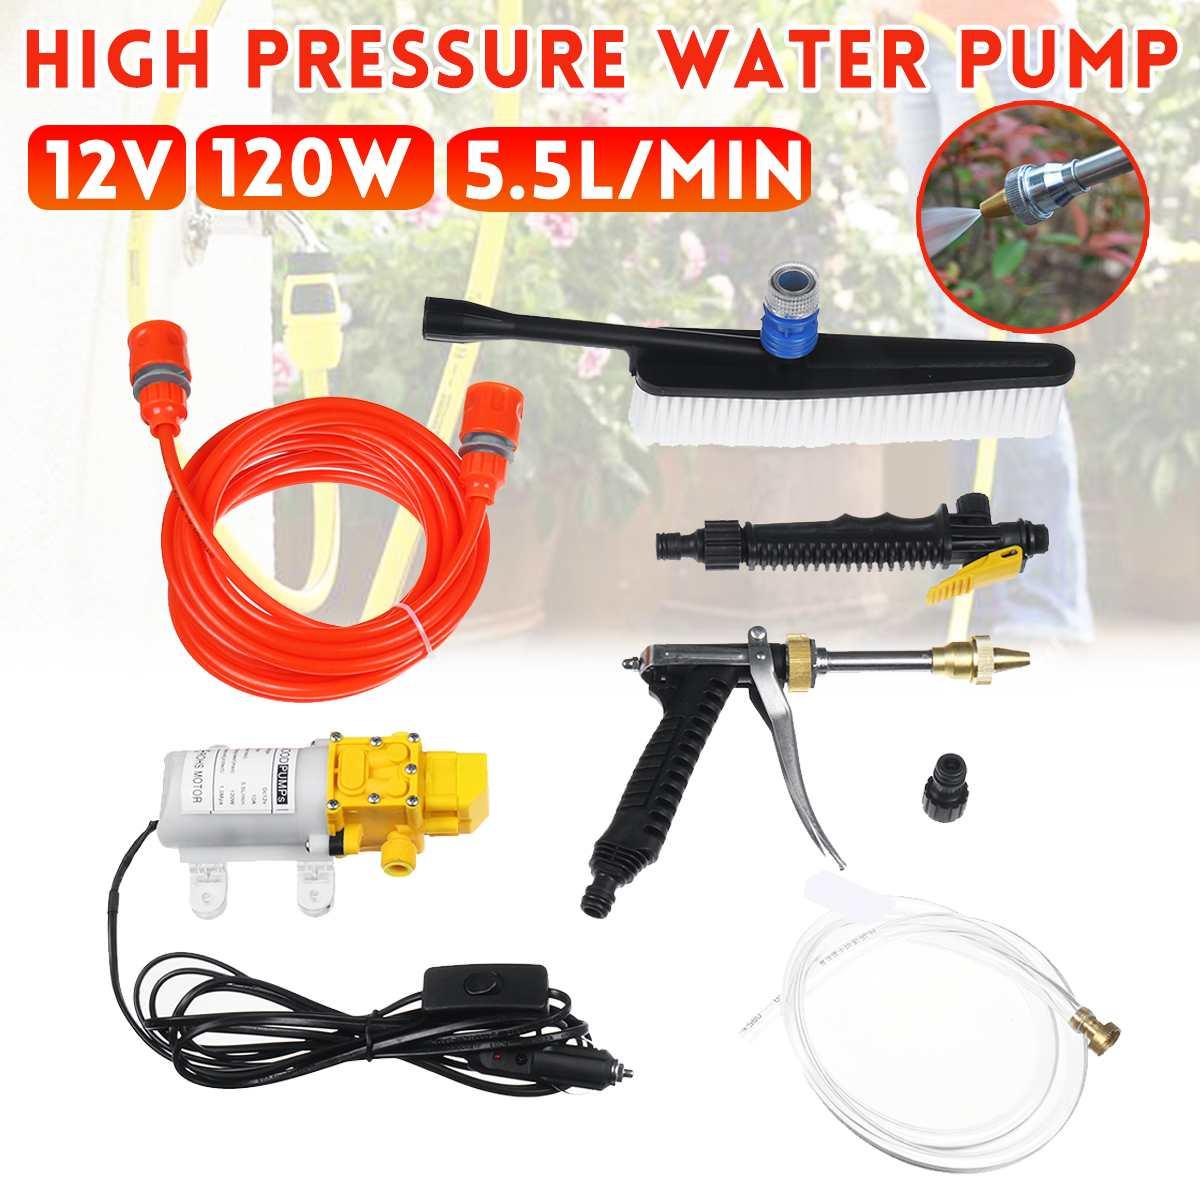 12V 120w Car Washer Guns Pump Car Sprayer High Pressure Cleaner Car Care Portable Washing Machine Electric Cleaning Auto Device